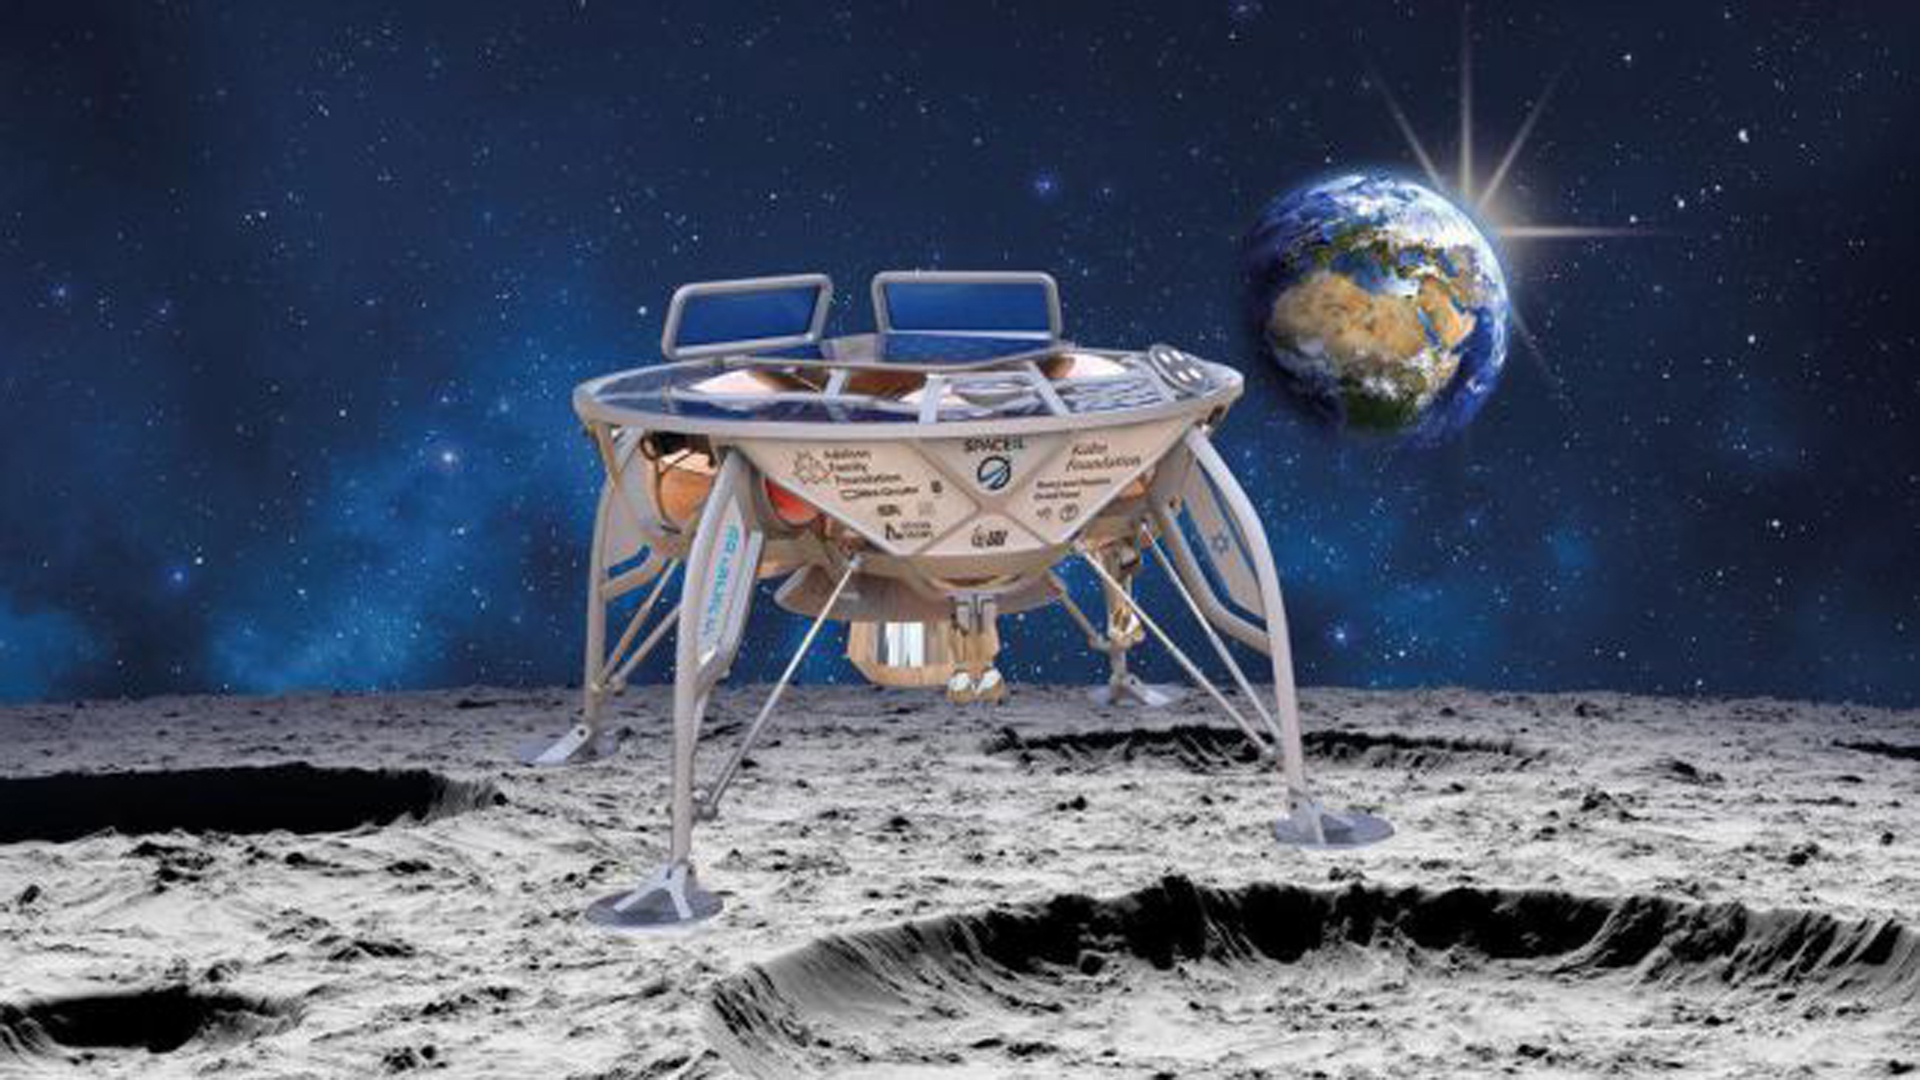 Una imagen que no pudo ser, la de Beresheet en la Luna